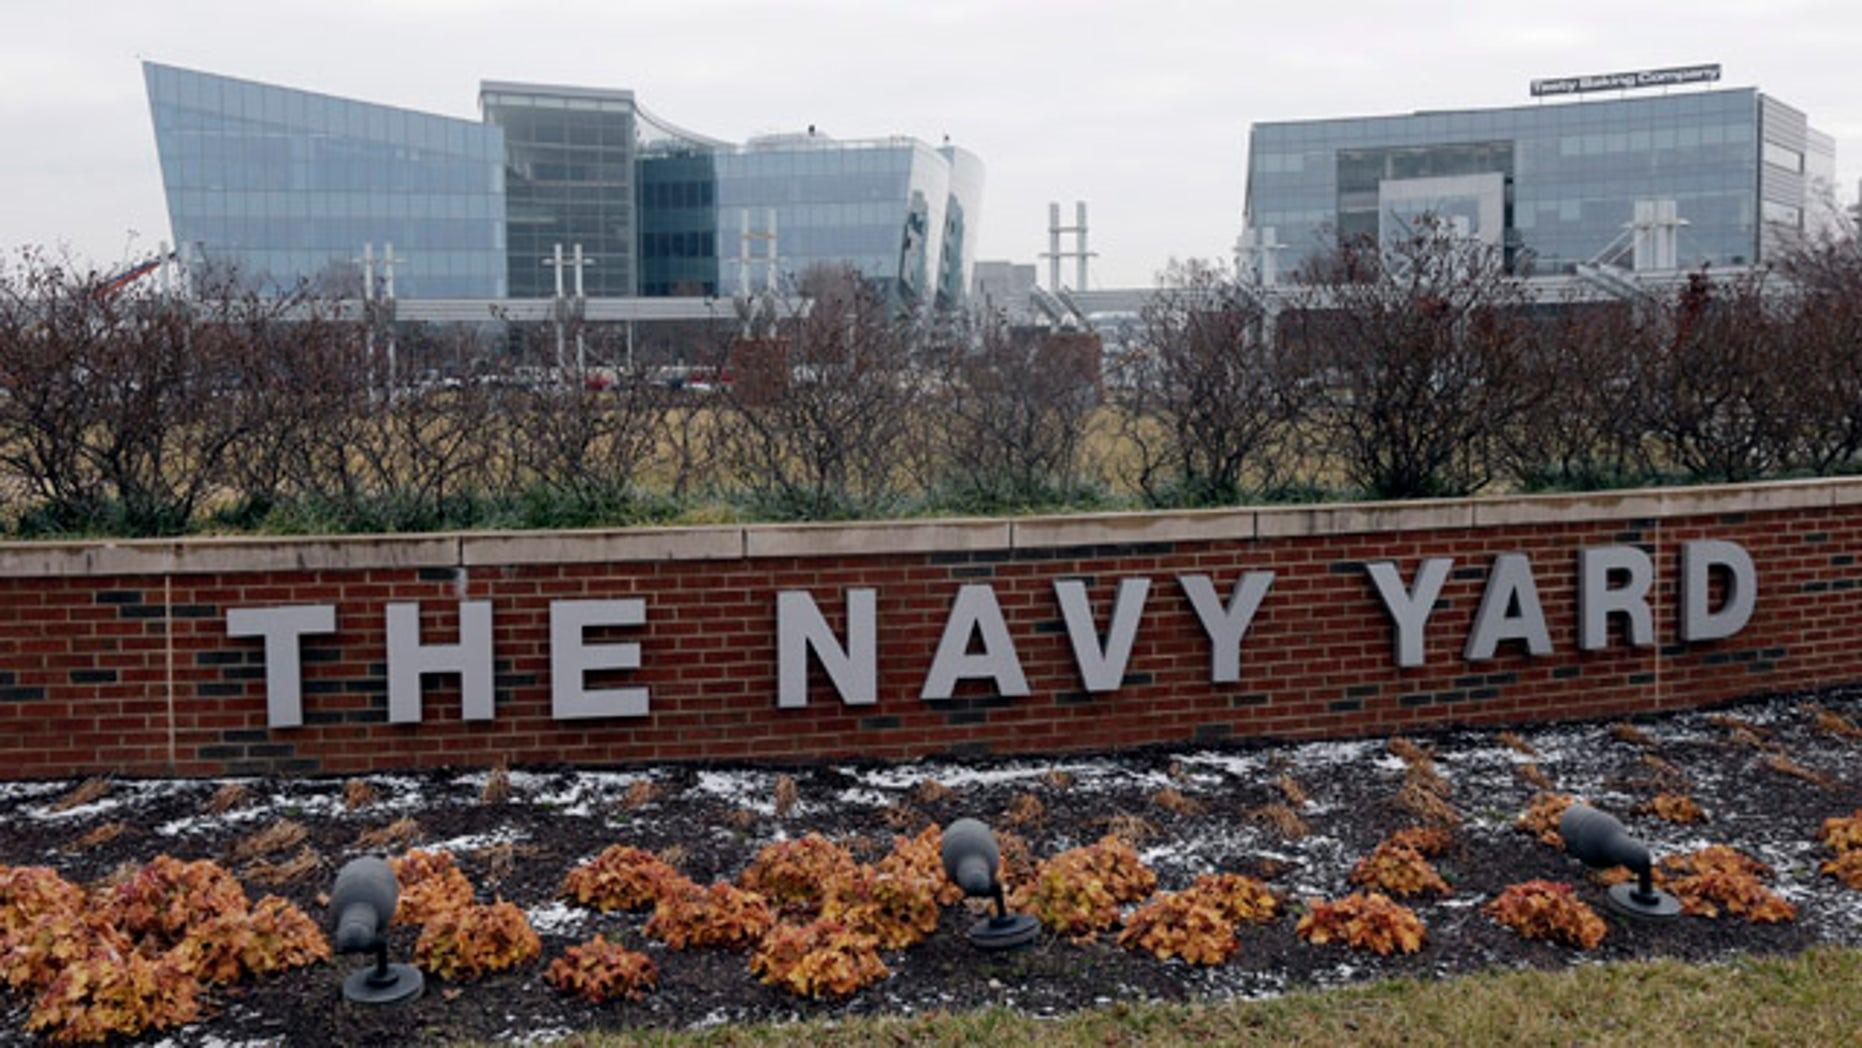 Feb. 6, 2013: The new GlaxoSmithKline building, top left, at the Navy Yard in Philadelphia.